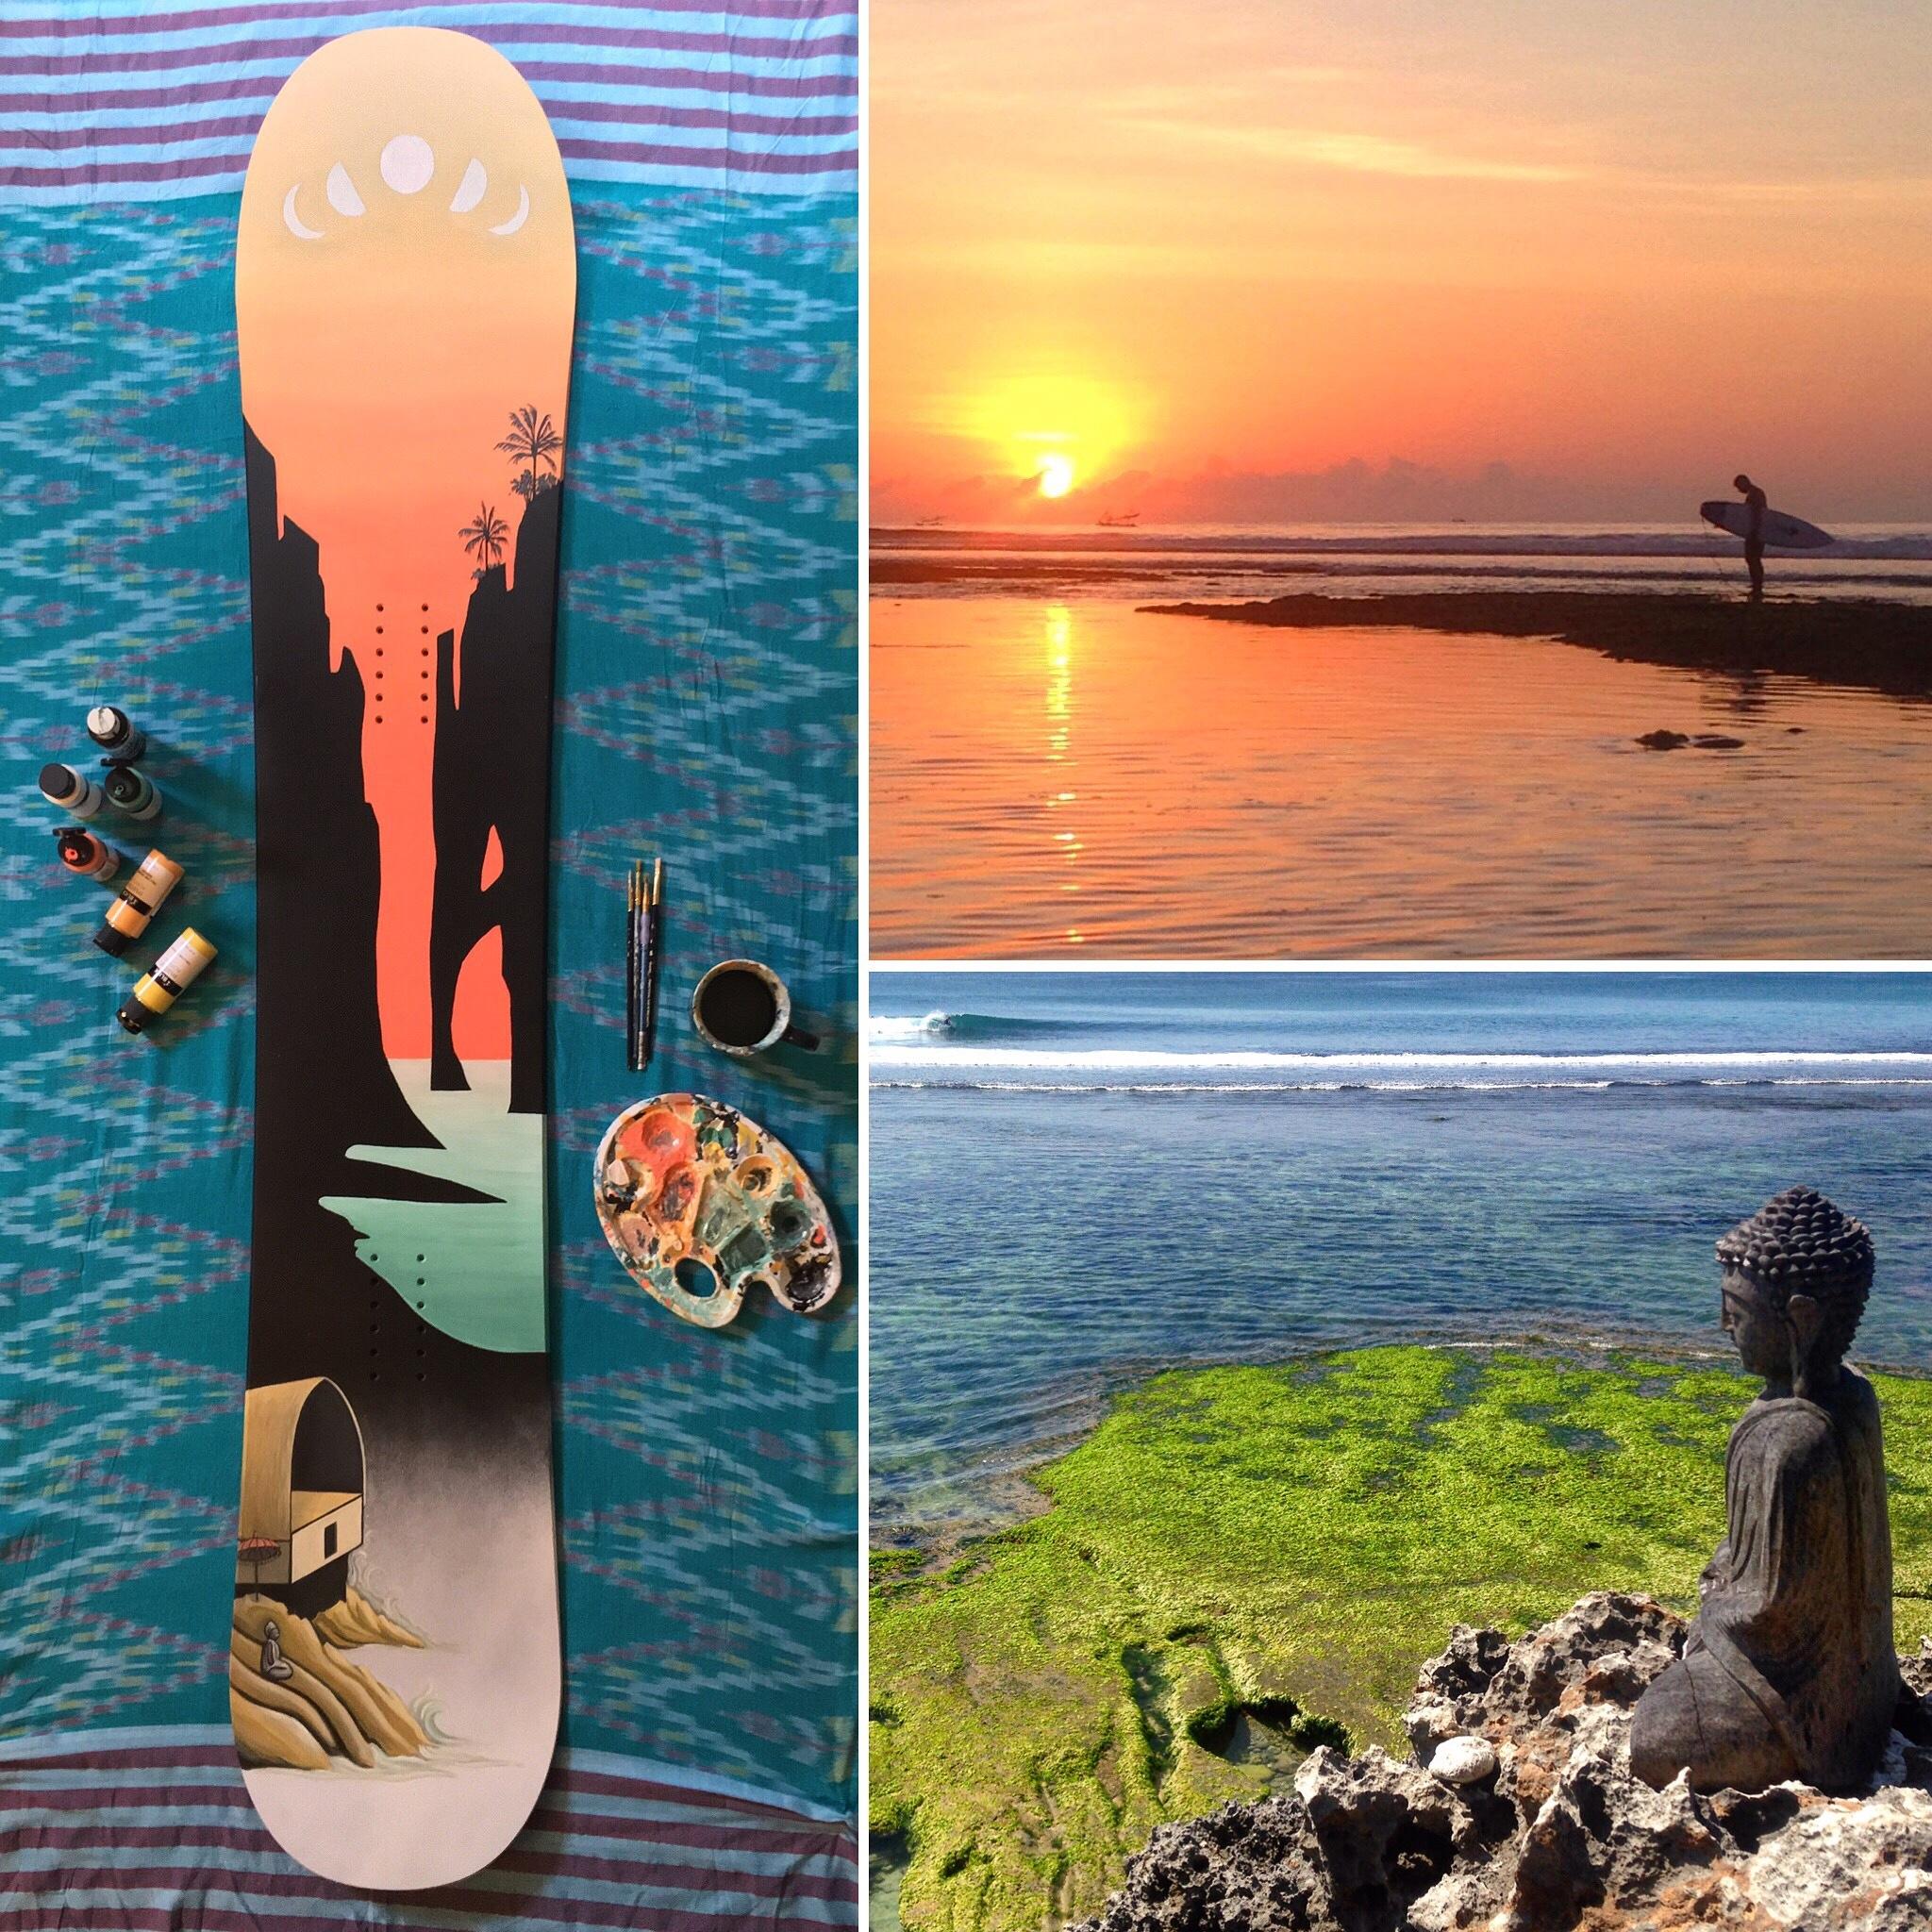 Ode to Bali, Derby board